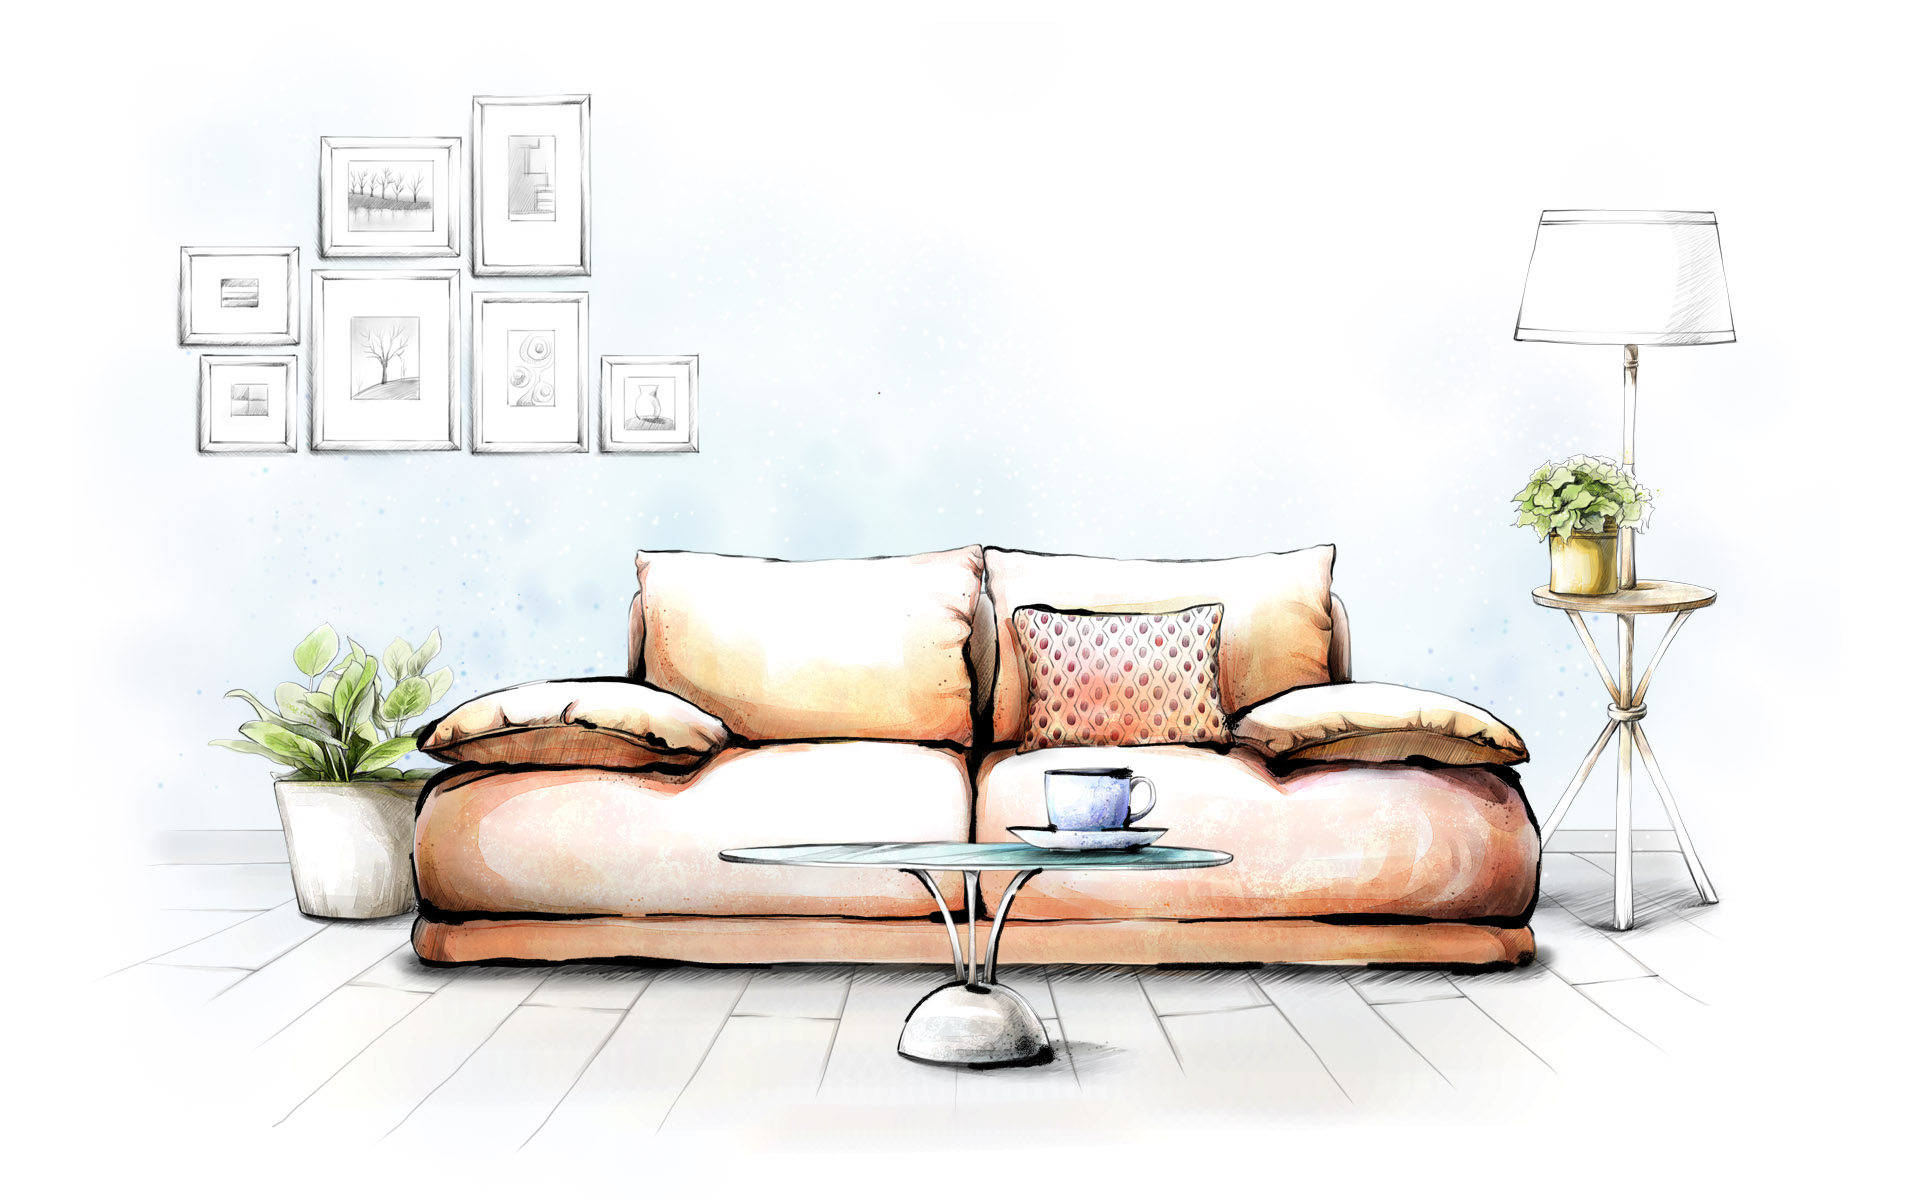 1920x1200 Drawing, Interior, Sofa, Art